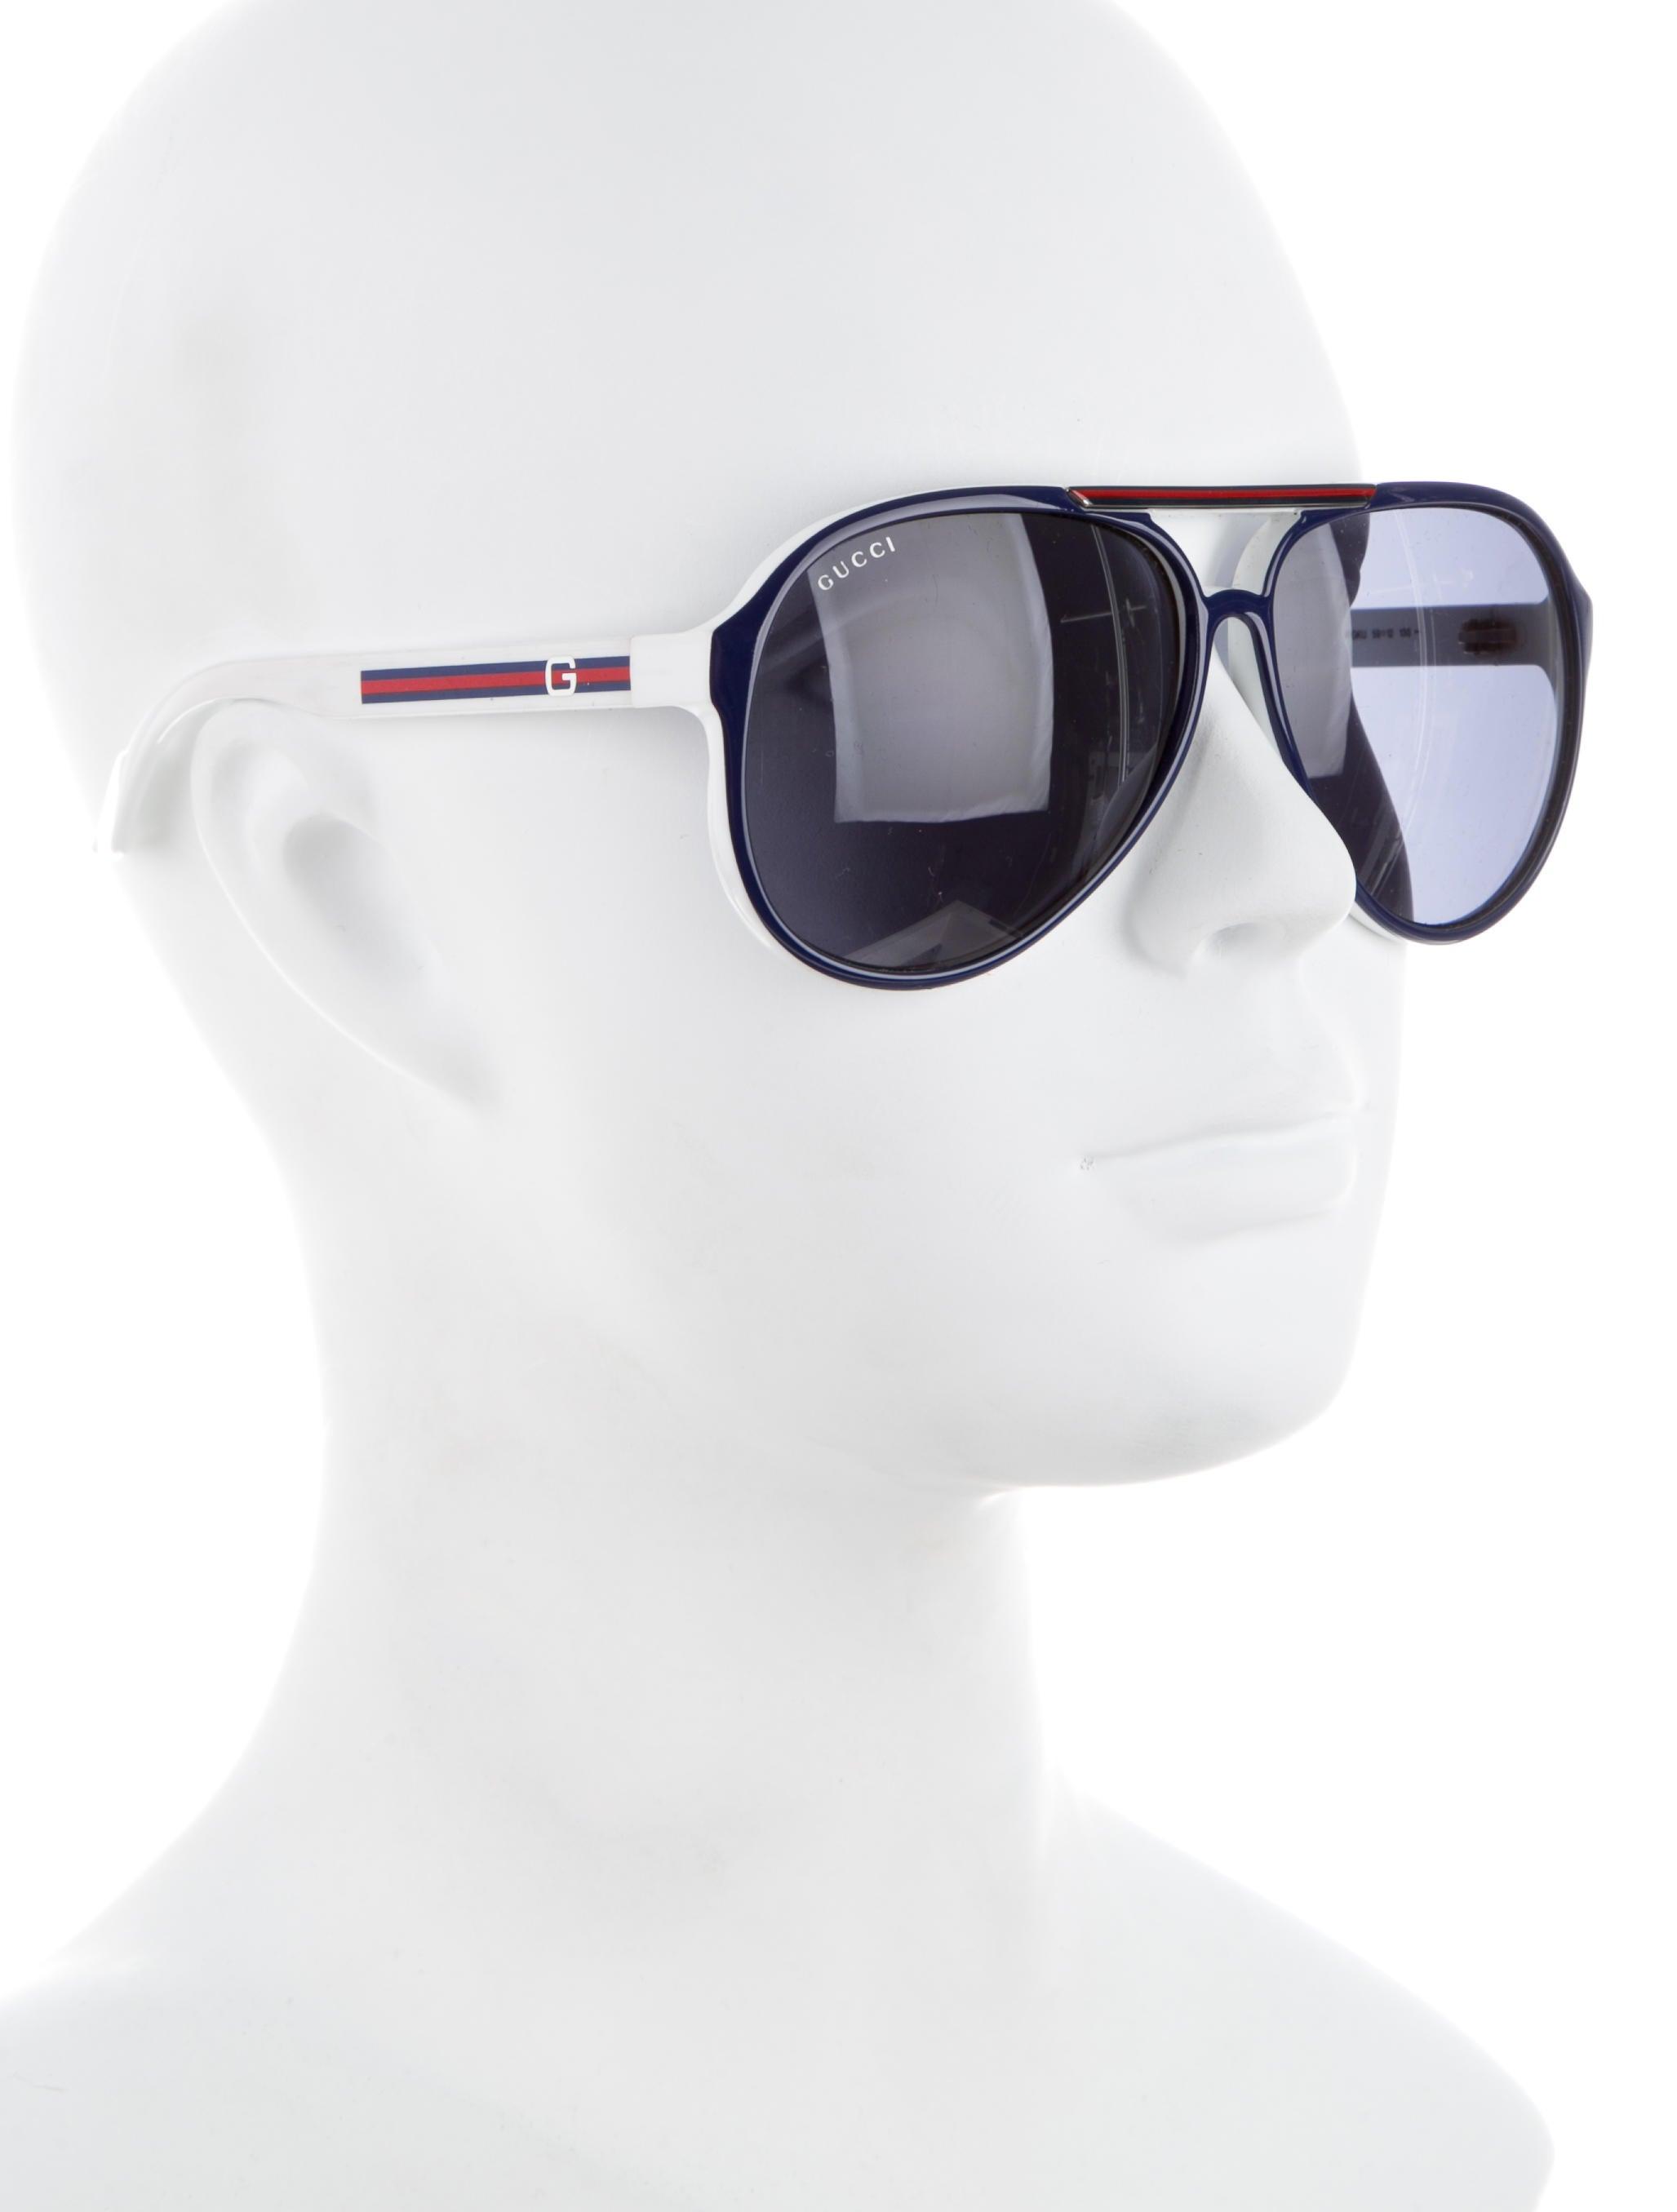 07713ed4f48 Gucci Aviator Sunglasses With Web